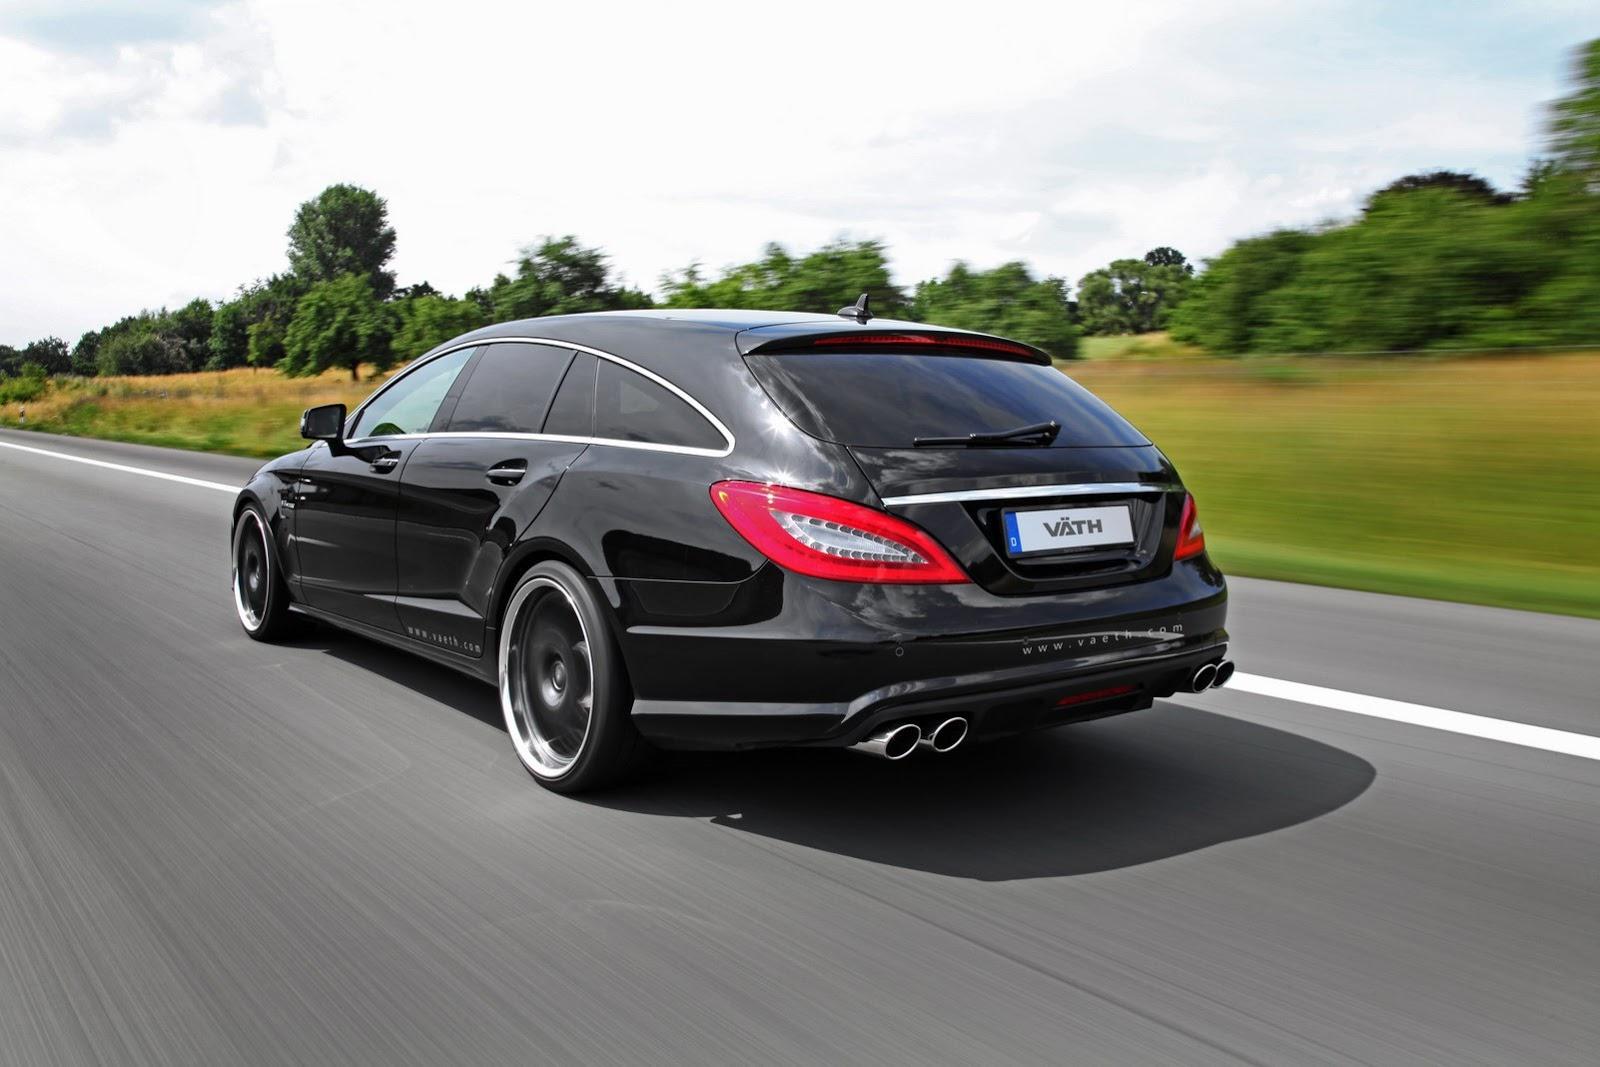 Vath-Mercedes-CLS-Shooting-Brake-2[2]